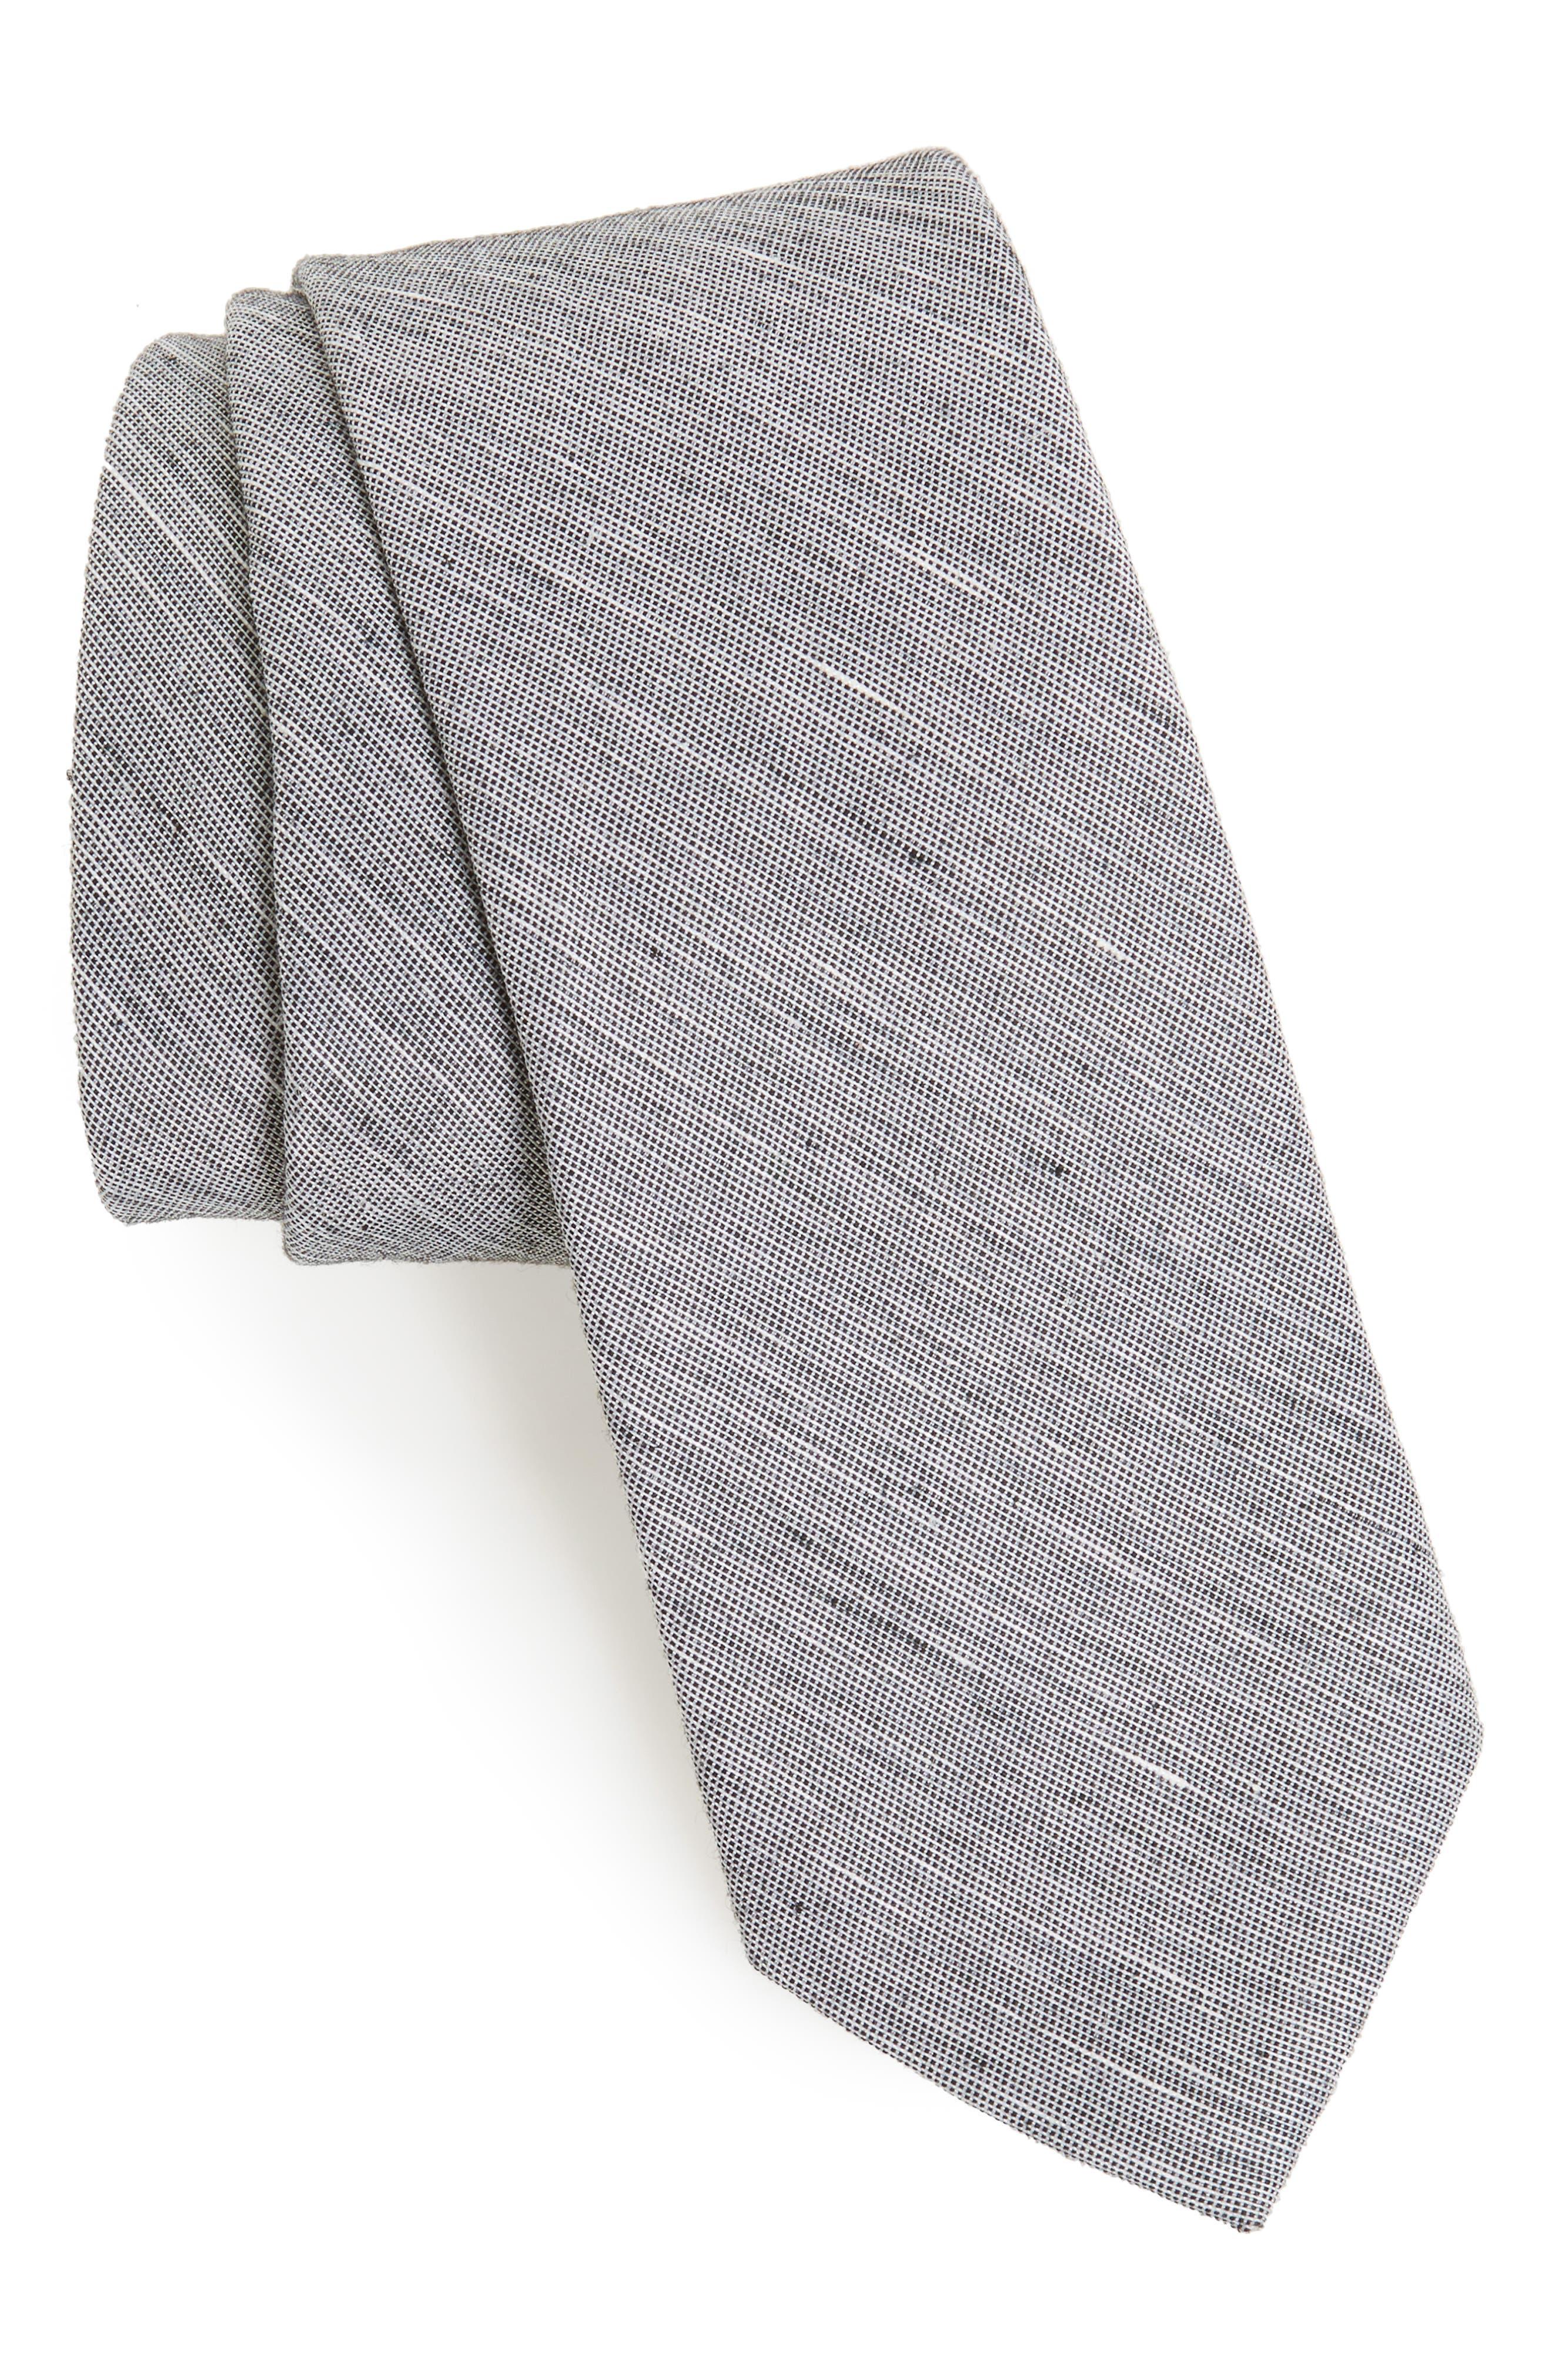 Adena Solid Silk Blend Skinny Tie,                         Main,                         color, 001